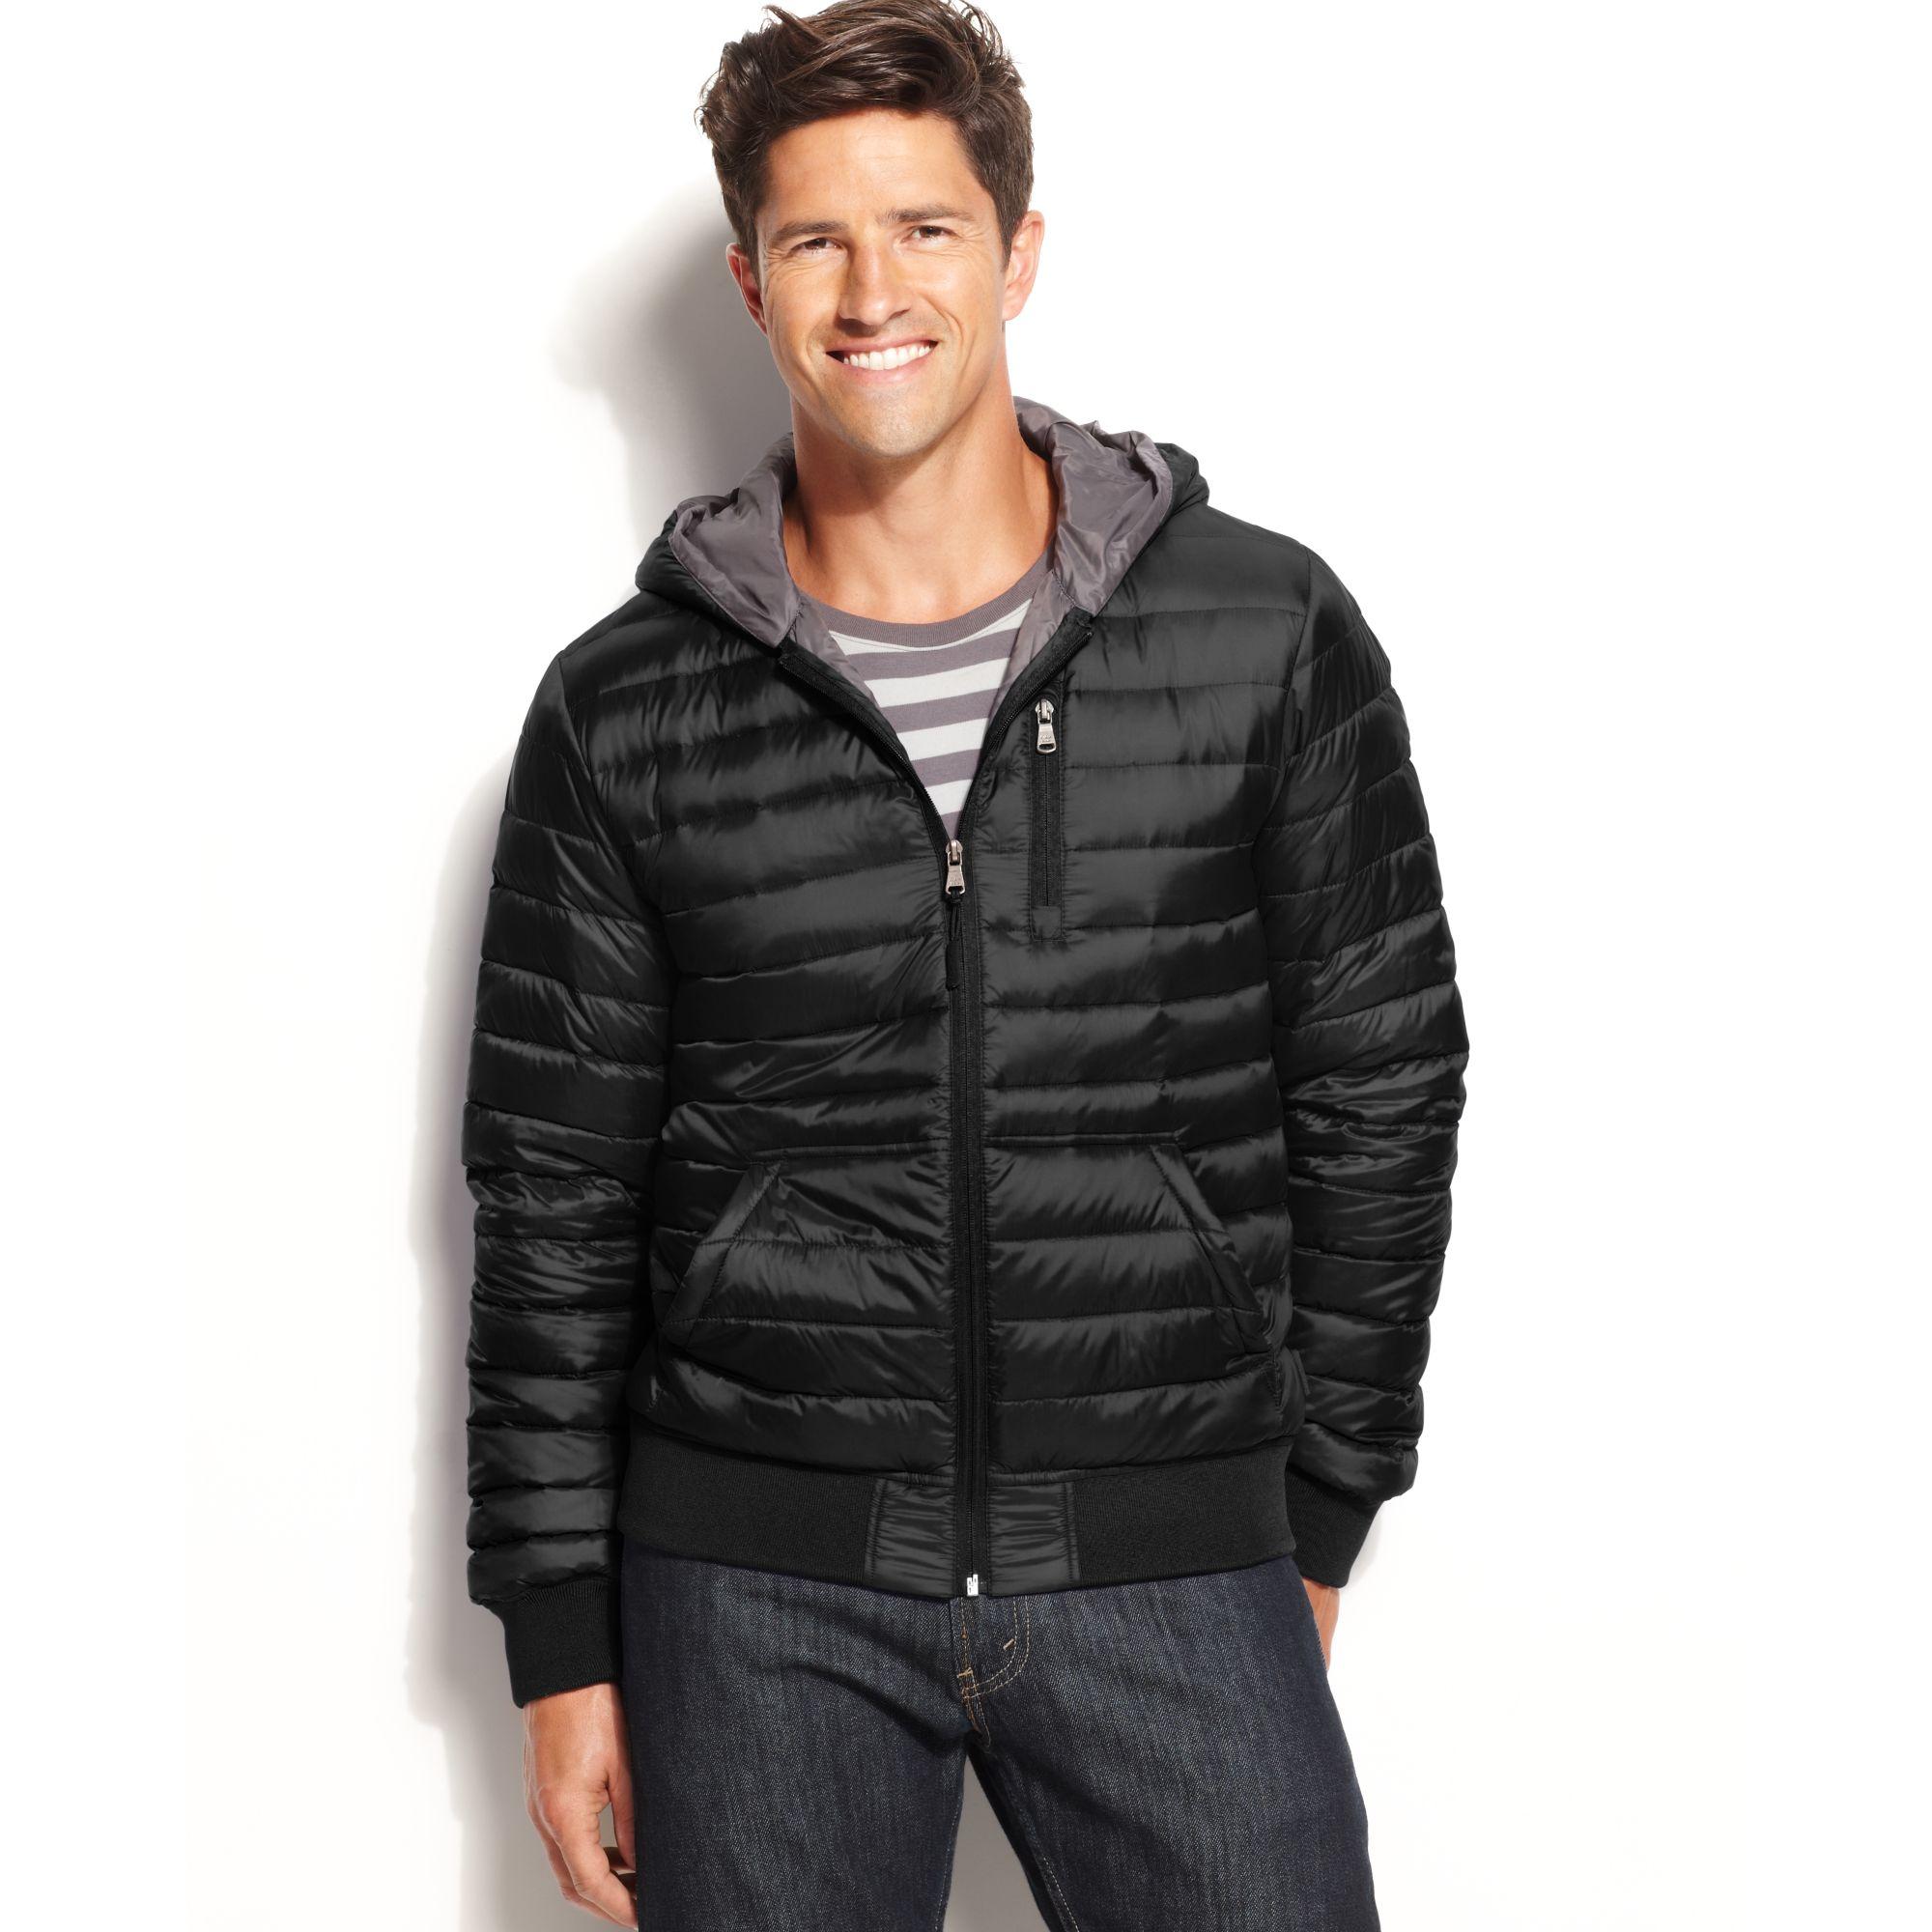 678deb02d Calvin Klein Black Hooded Packable Down Jacket for men